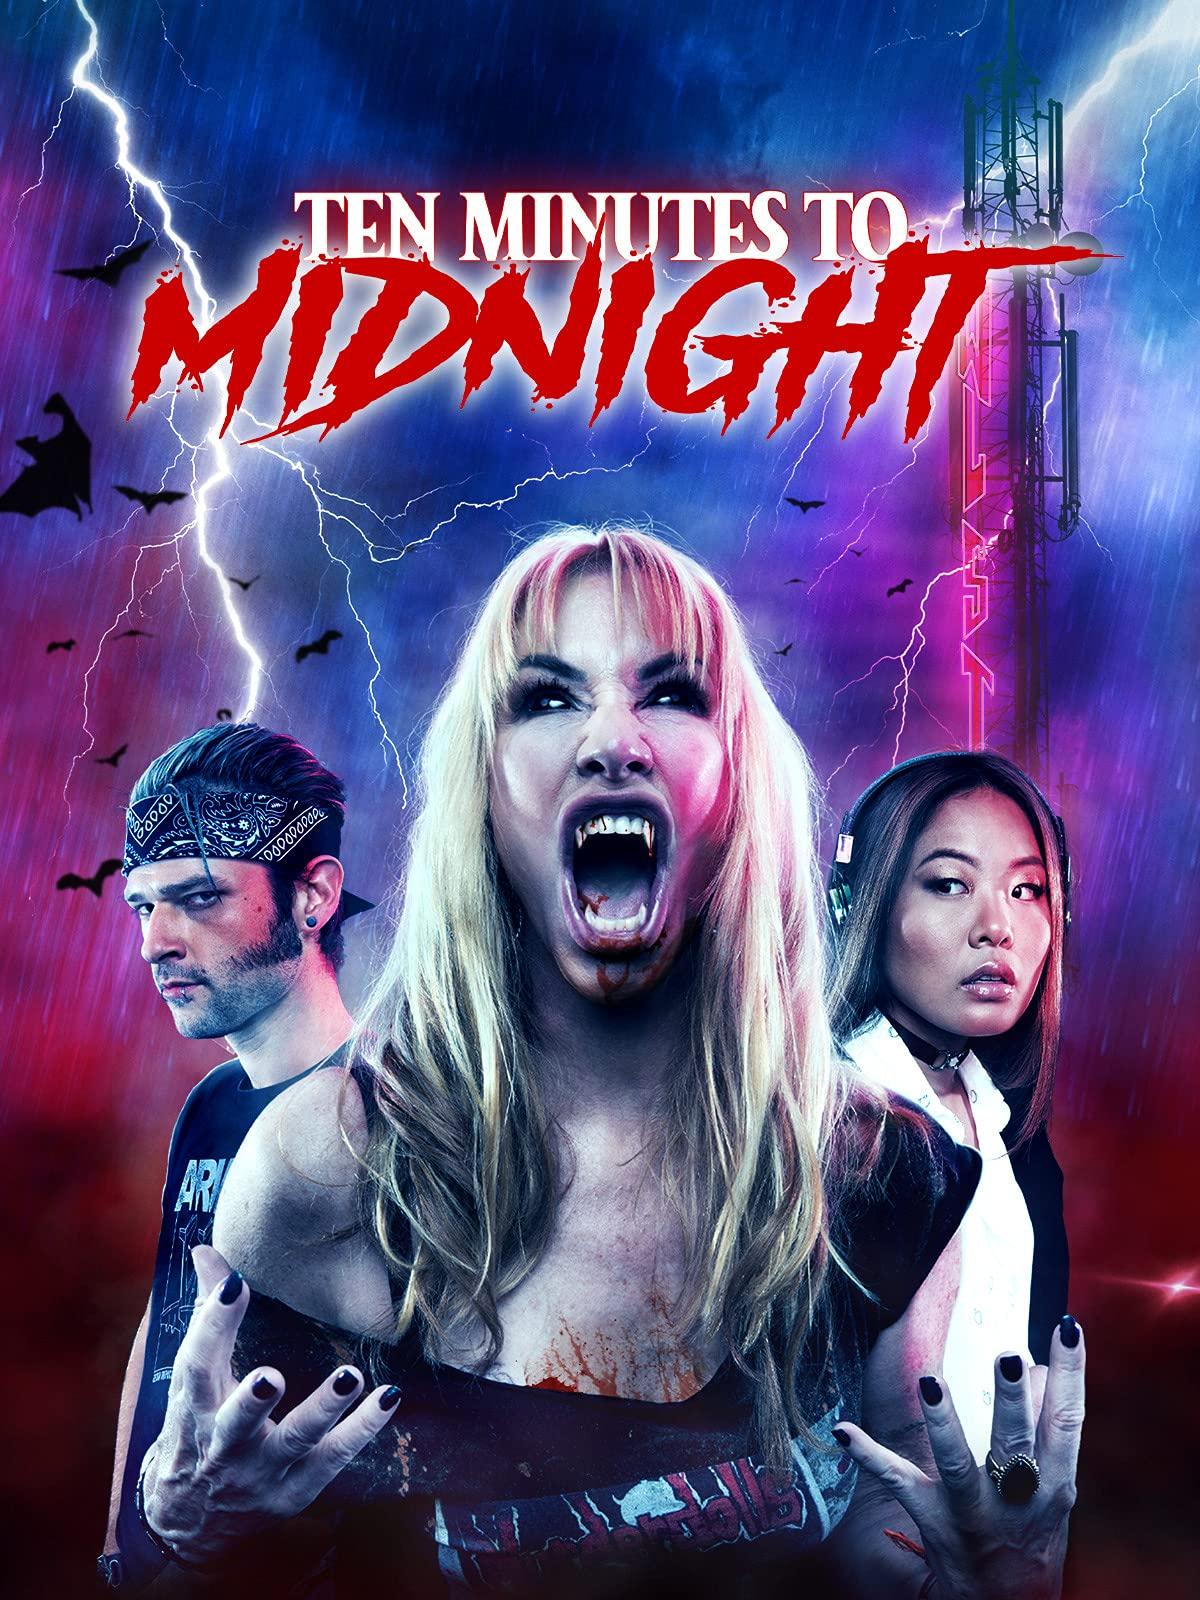 10 Minutes to Midnight